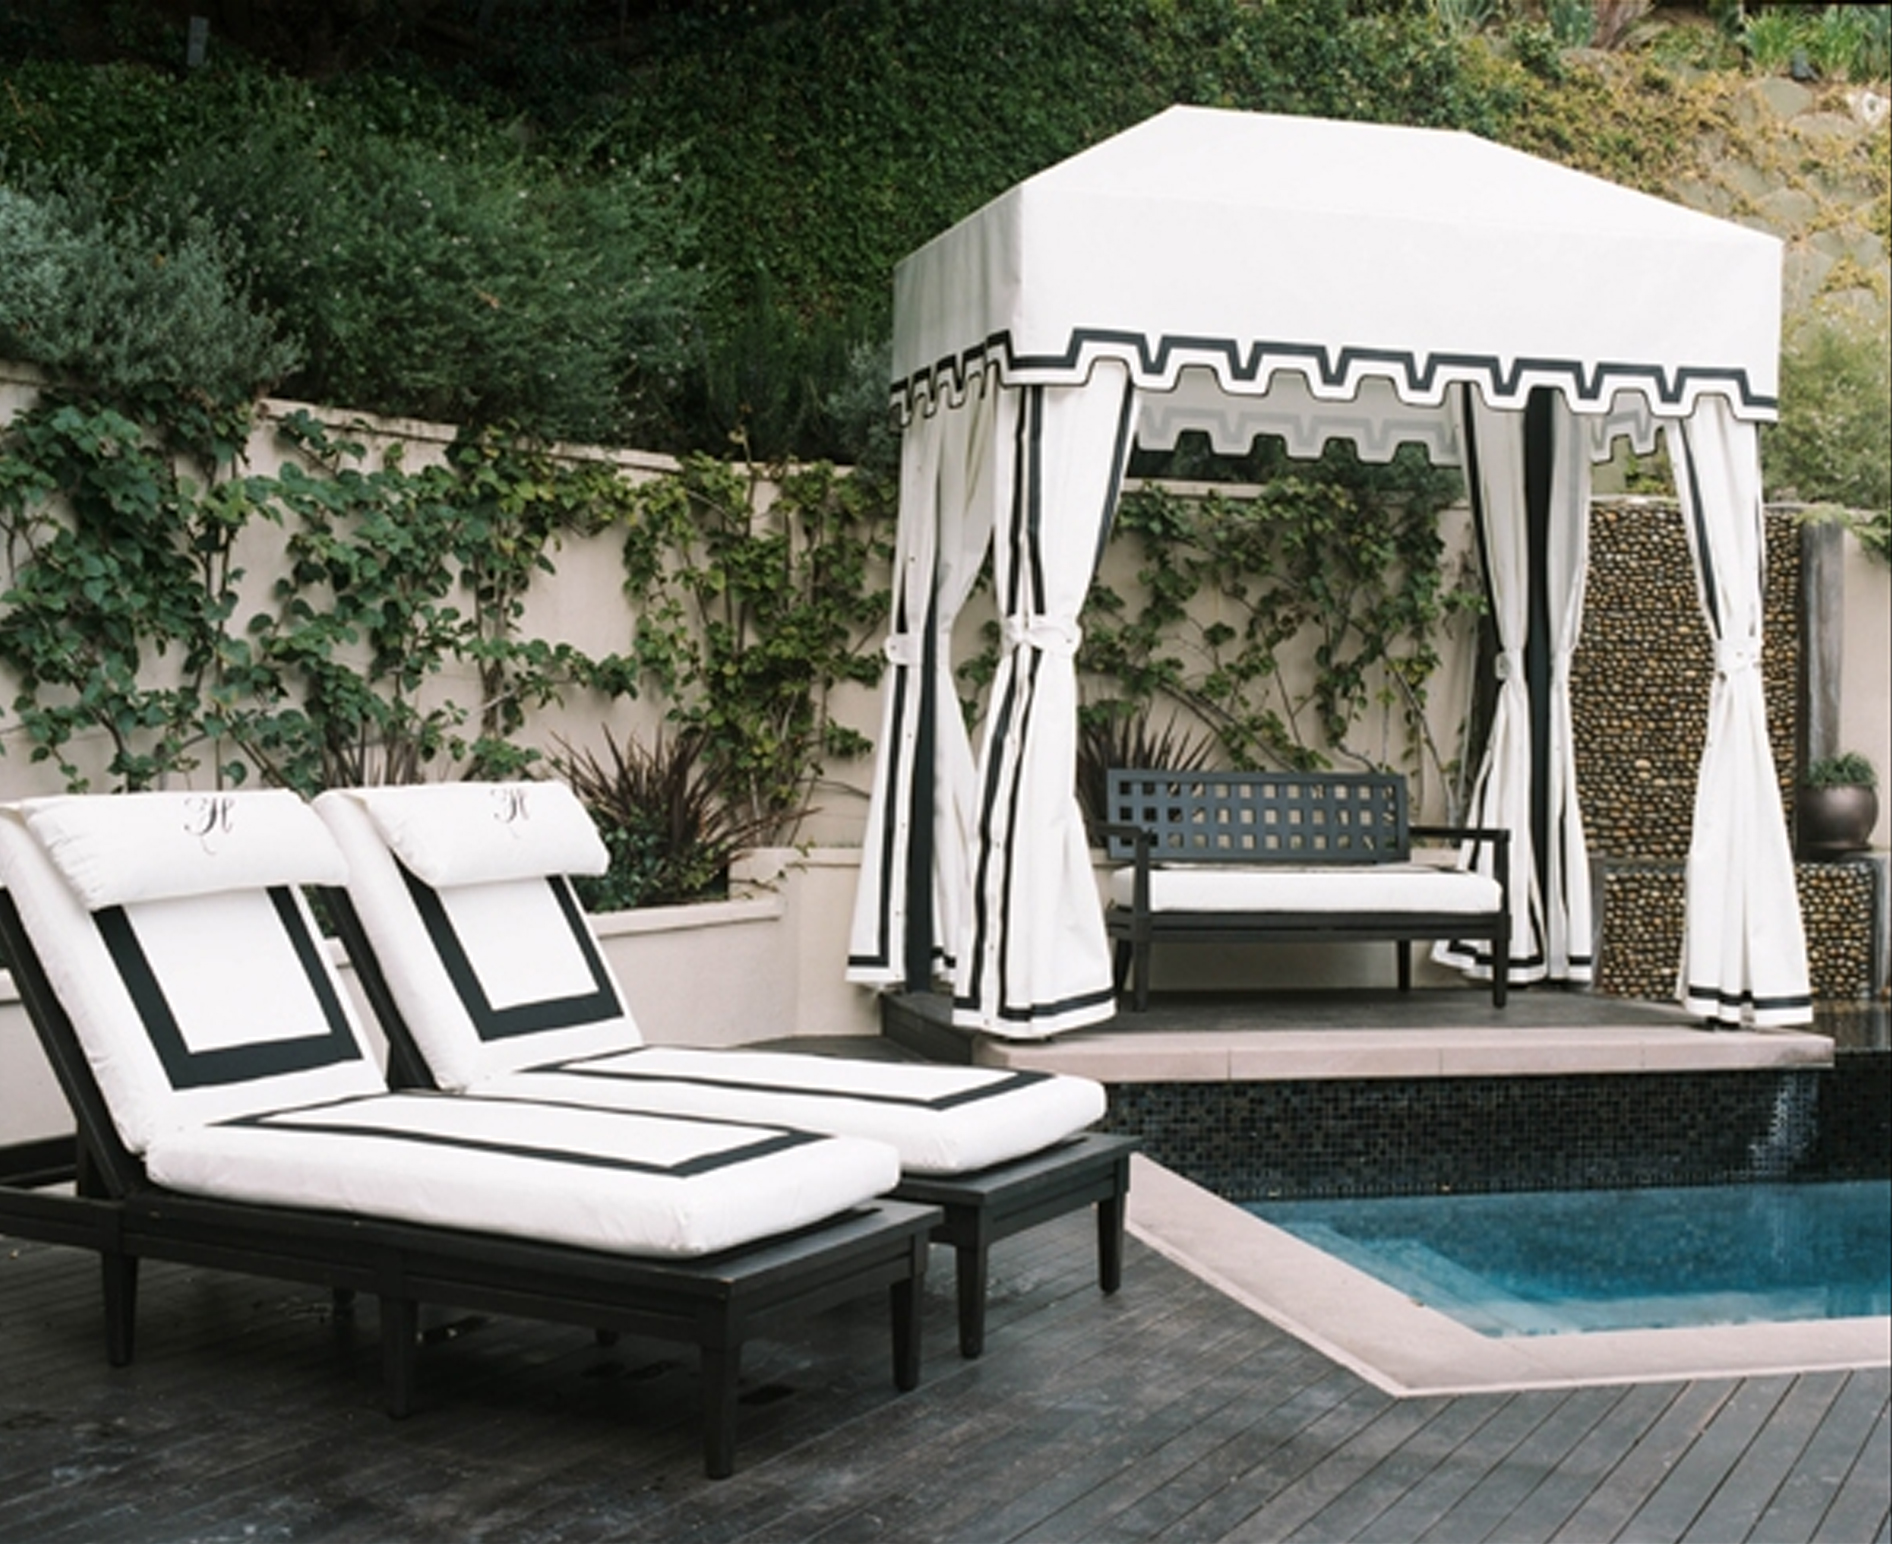 Pool Cabana Kits Design Homesfeed